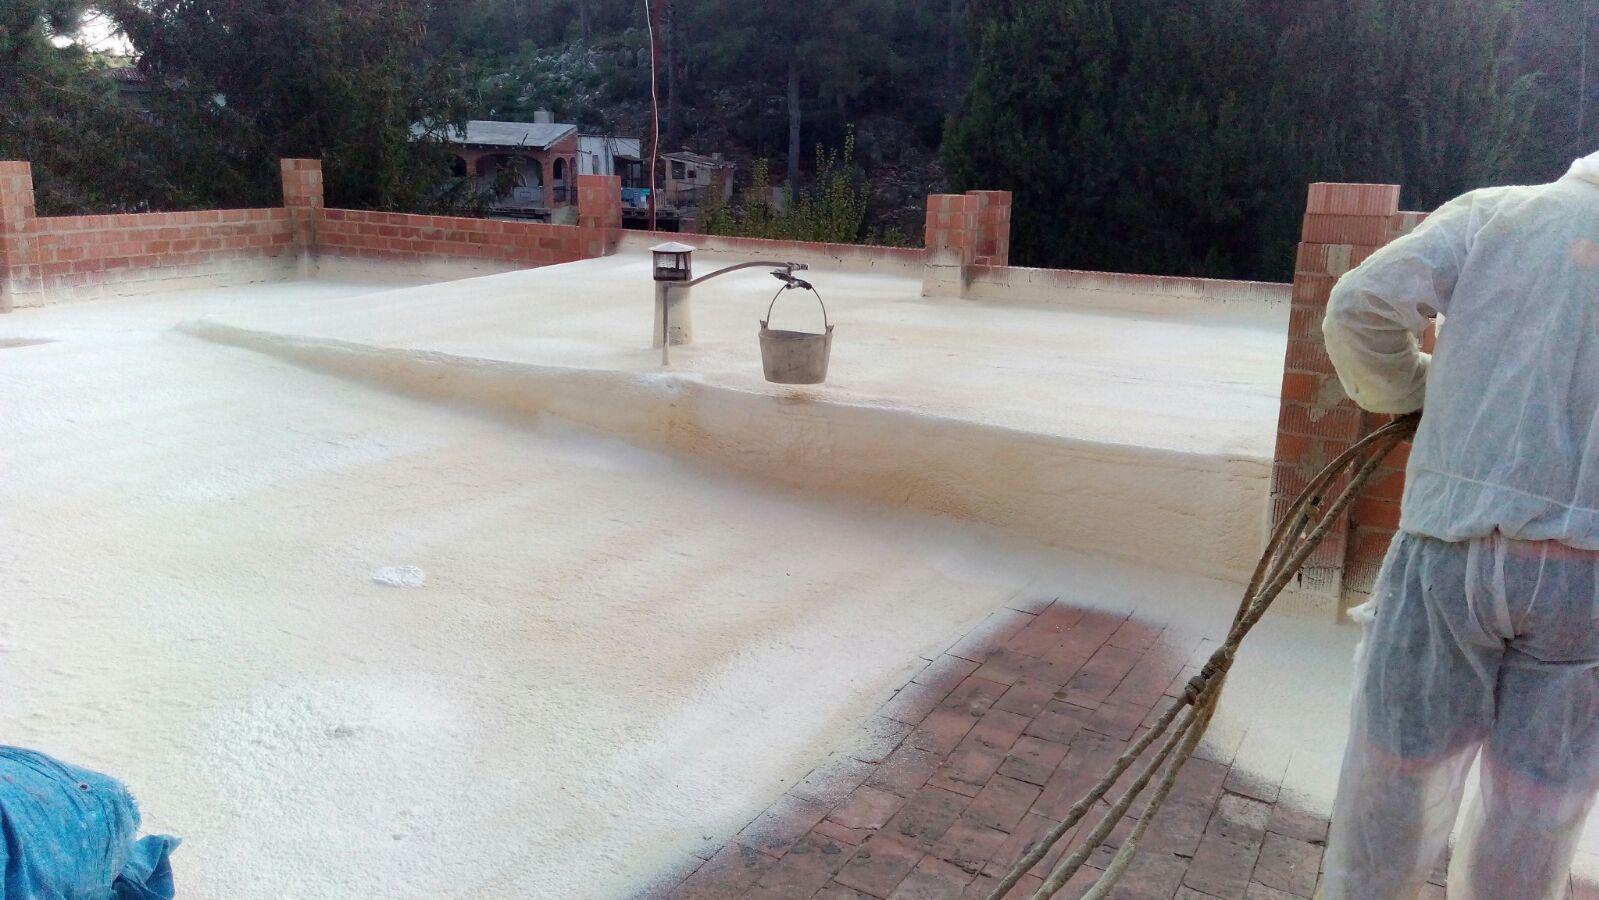 Foto 41 de Aislamientos acústicos y térmicos en Rafelcofer | Aislamientos de Poliuretano Jaime Femenia